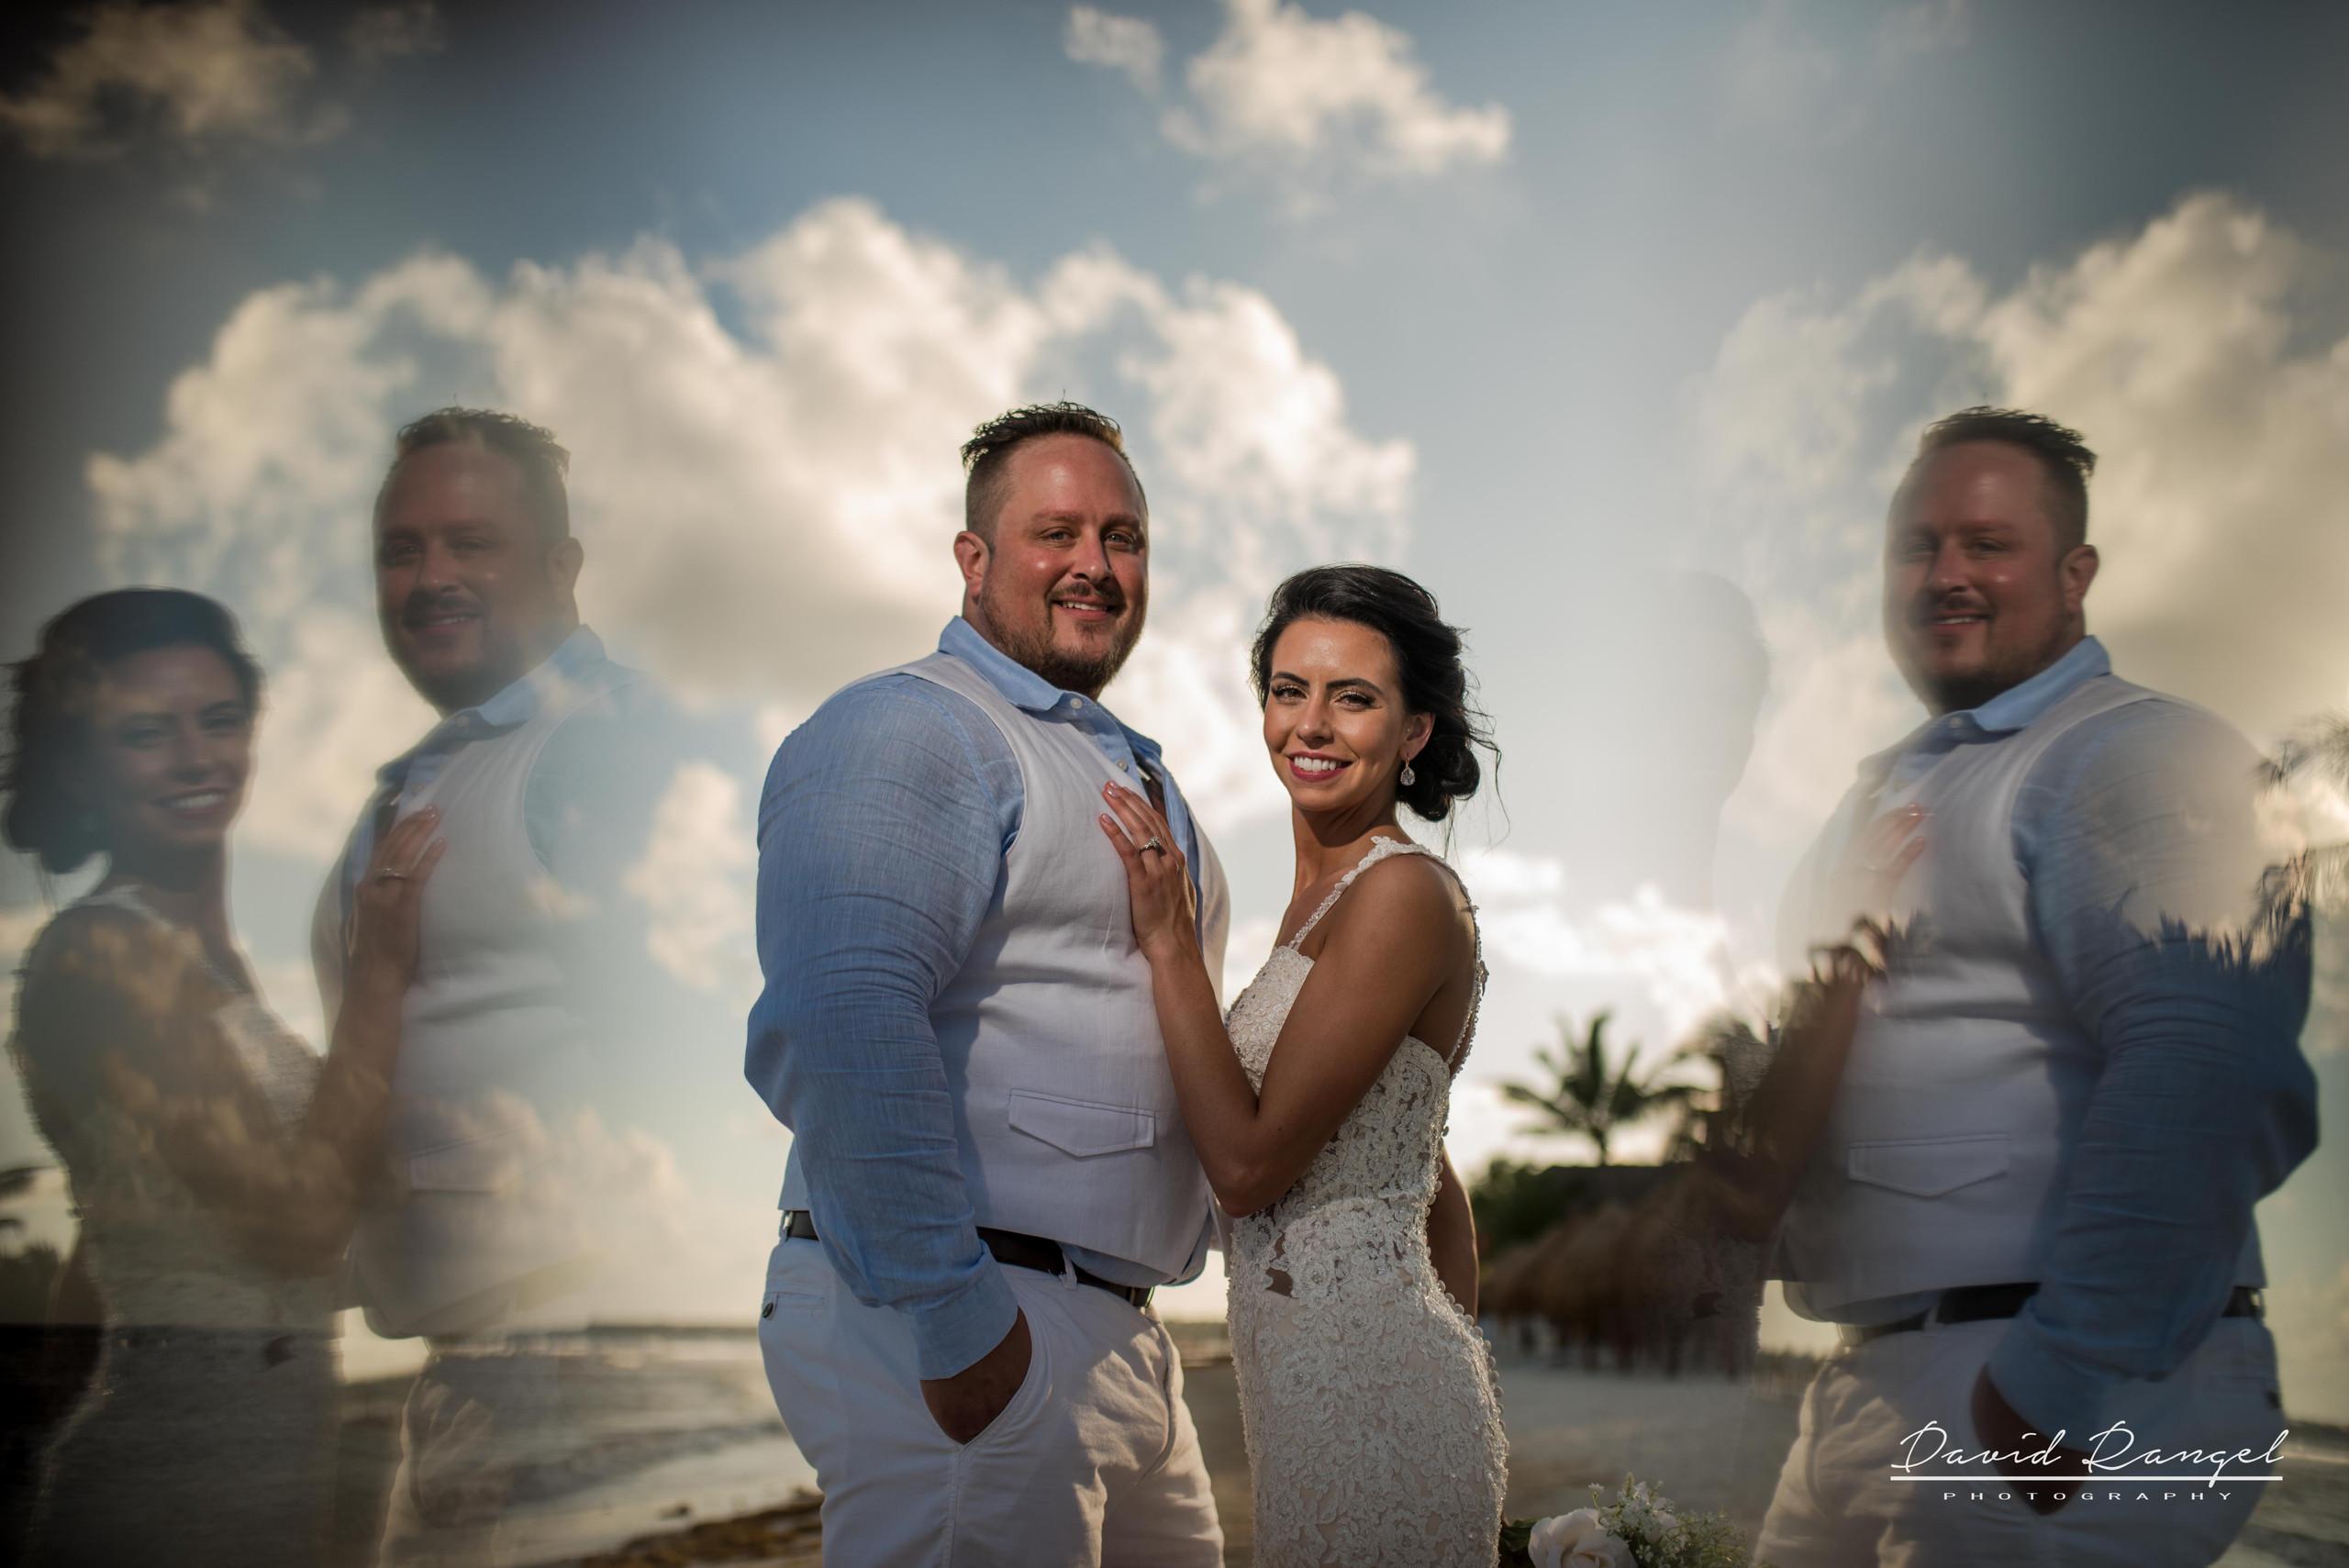 wedding+photo+bride+groom+bouquet+session+happy+reflection